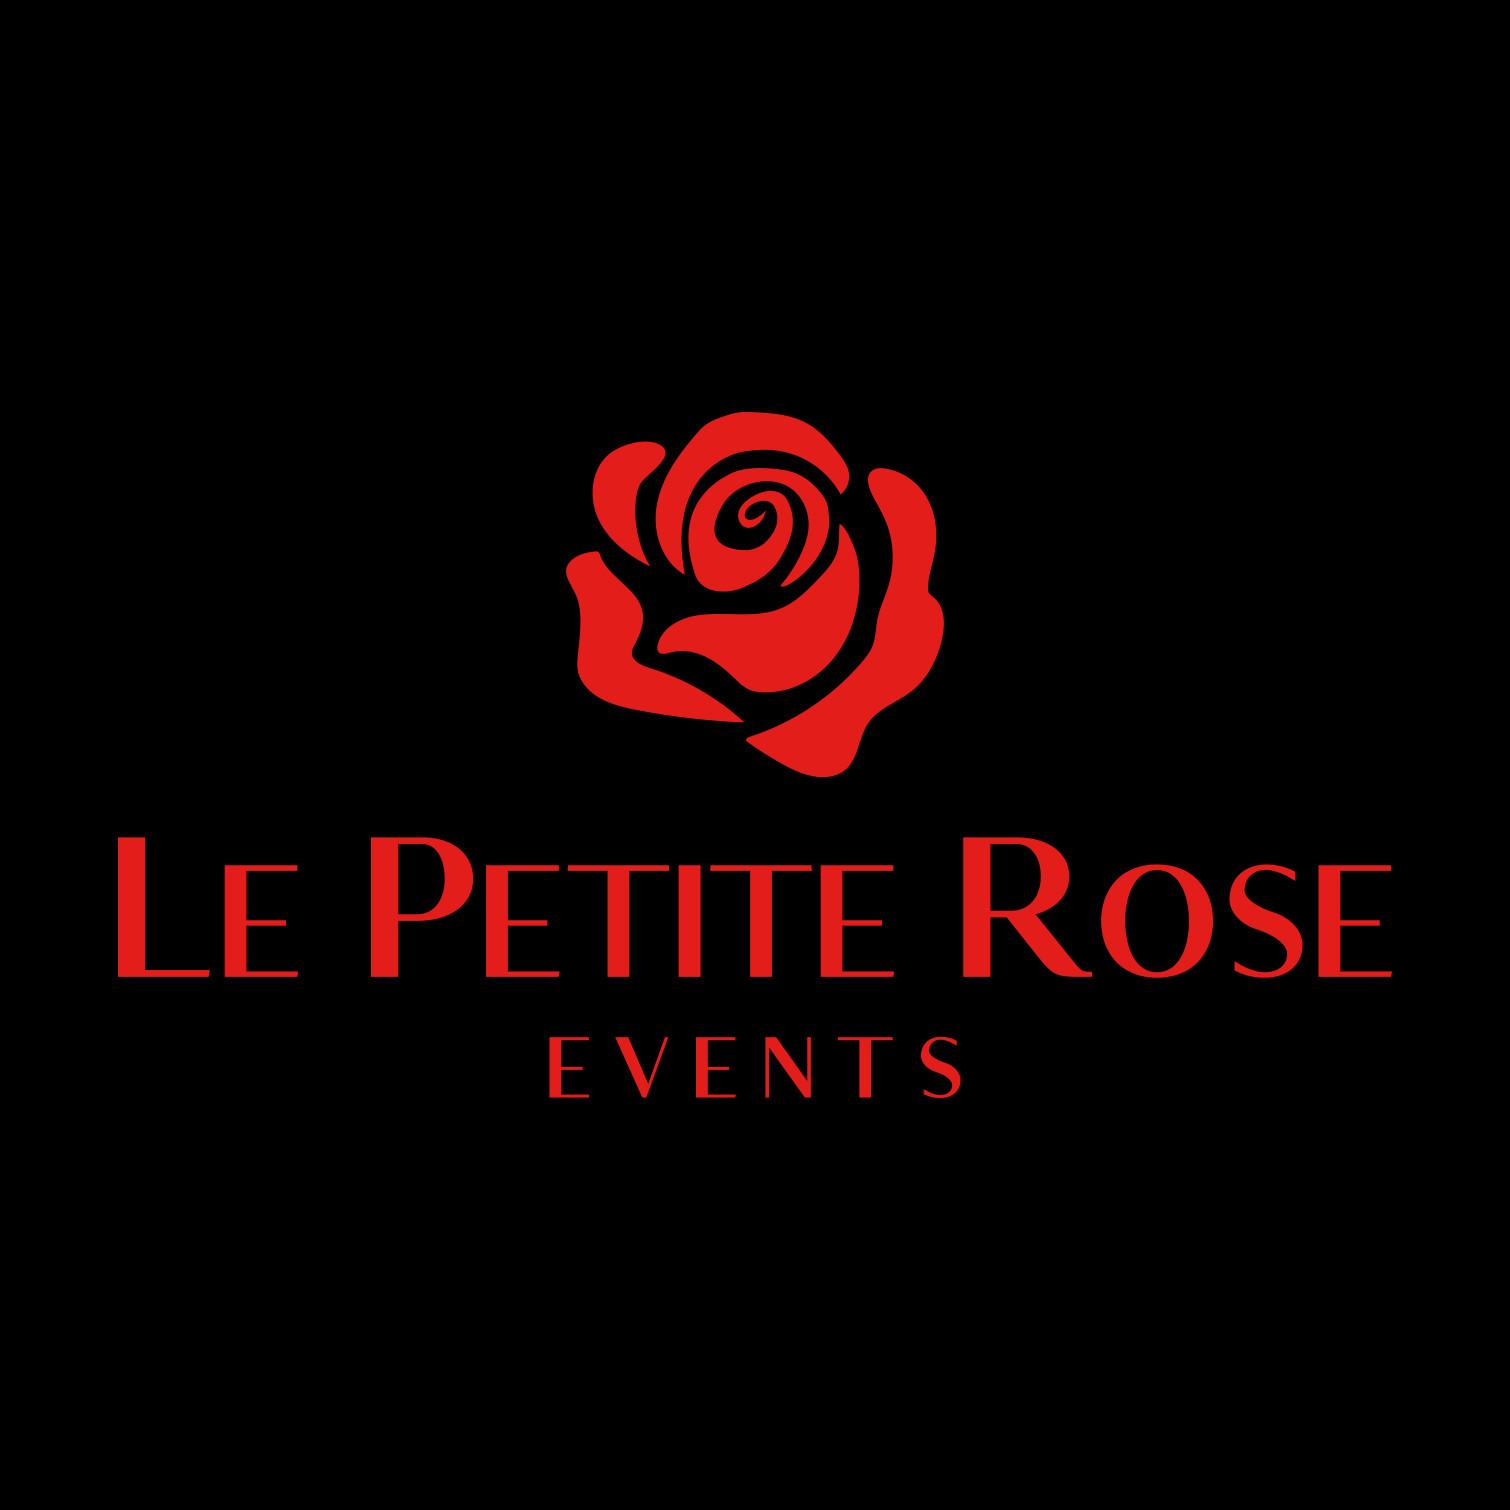 Cristian ricardi logo website template 1510x1510 red